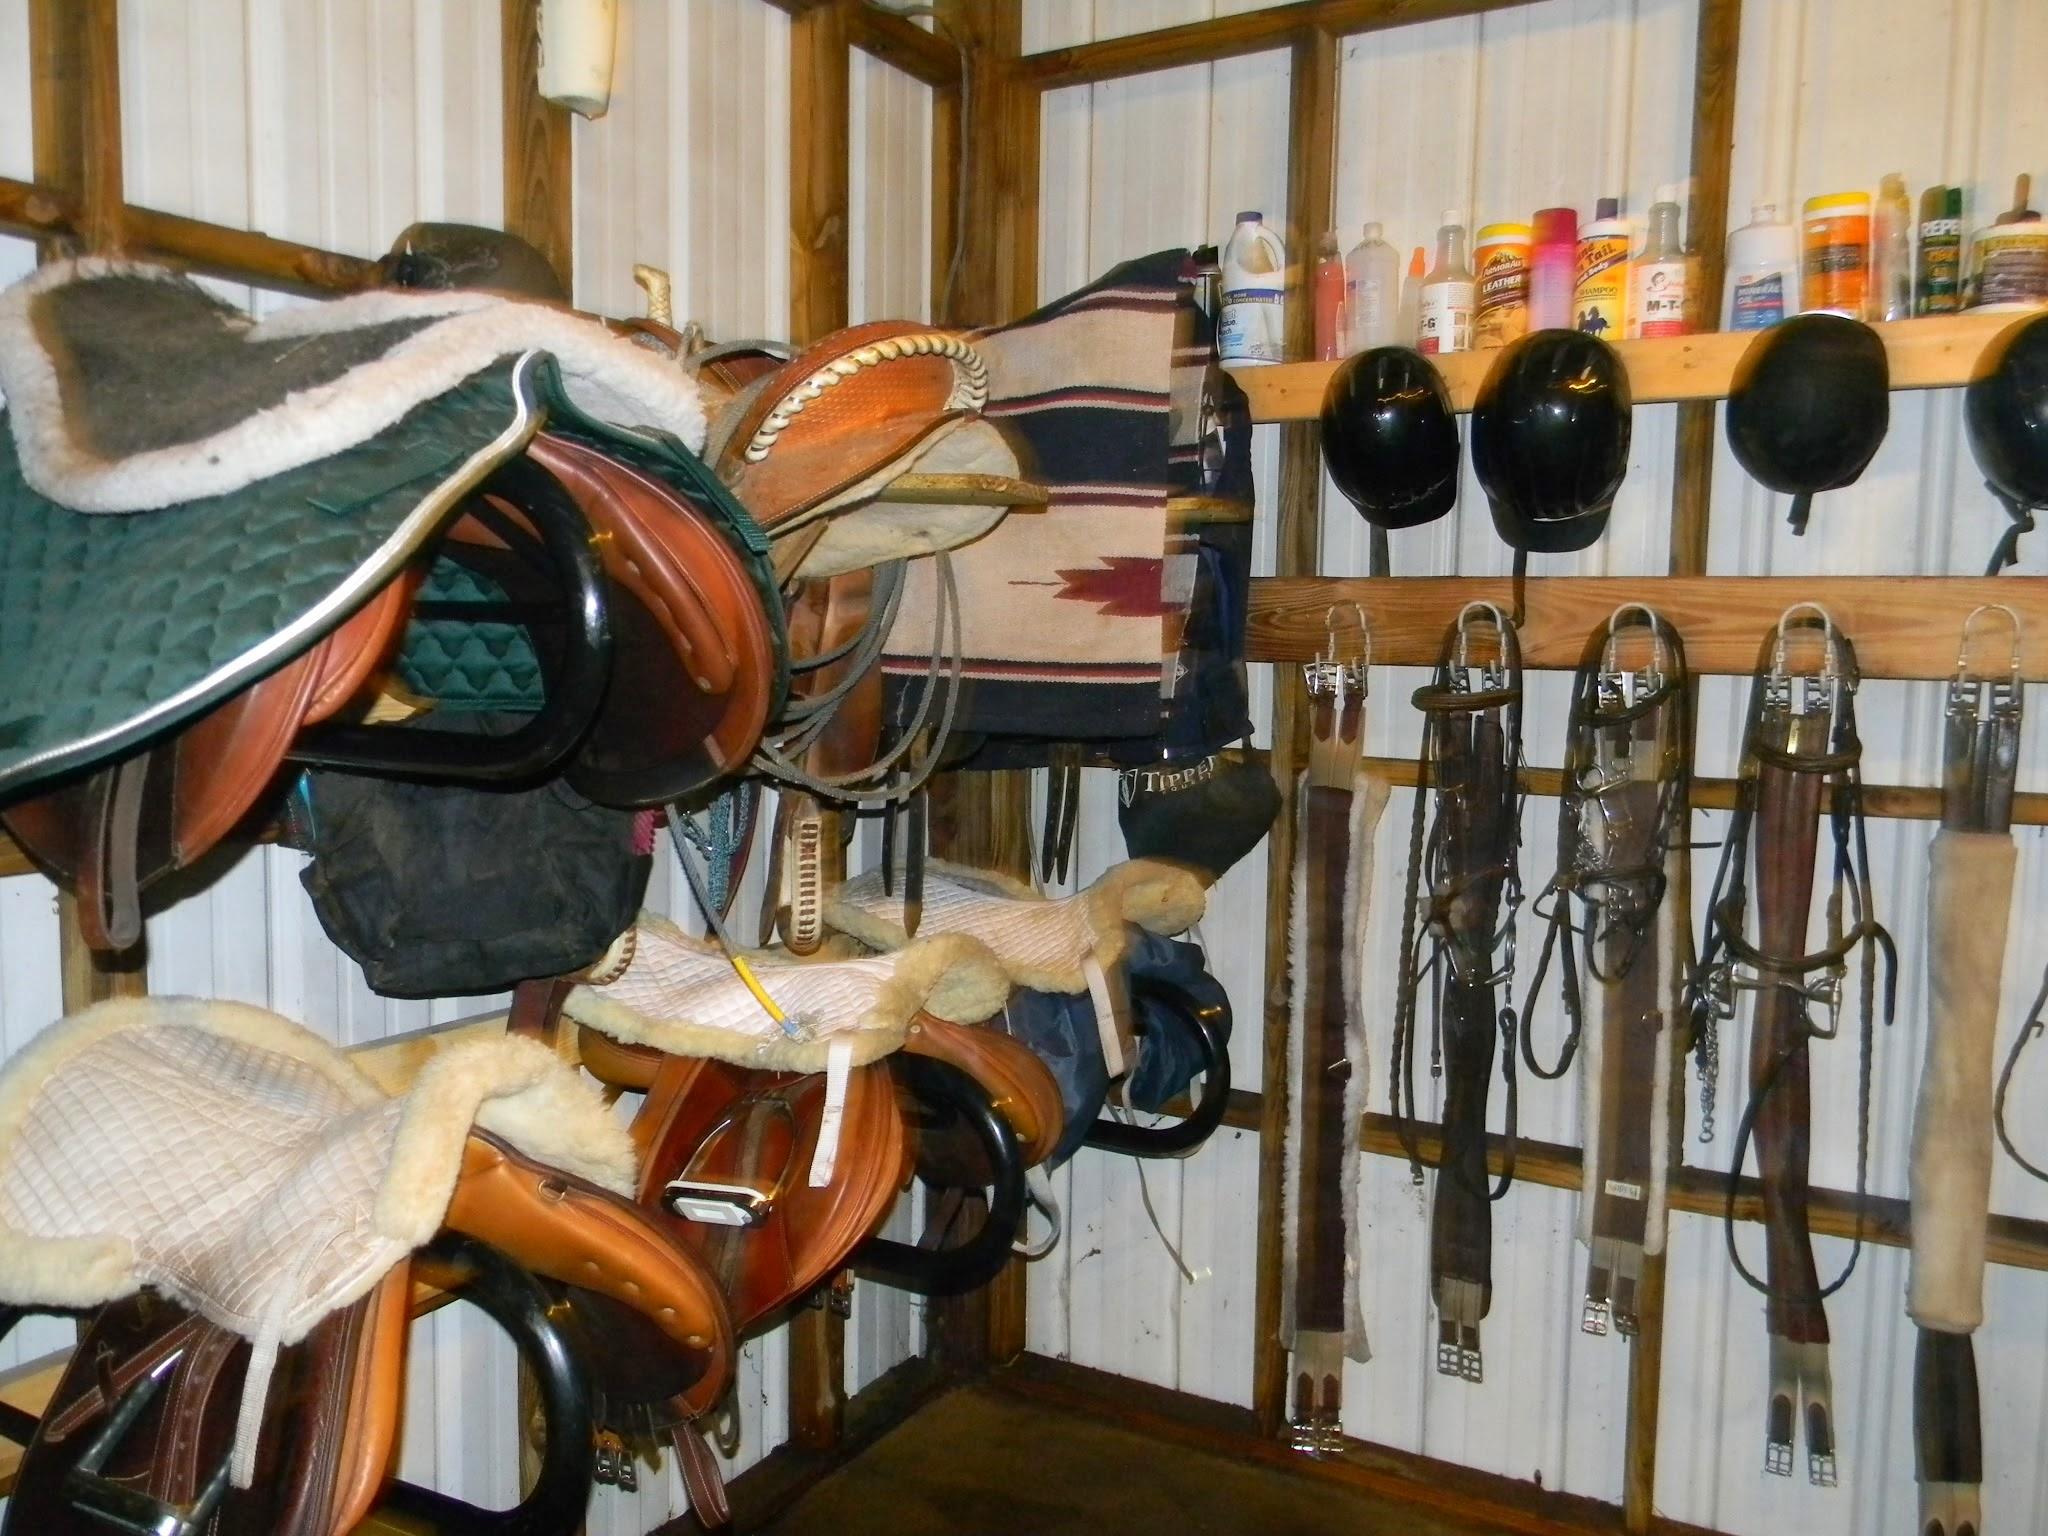 Cv Equestrian Horseback Riding Lessons Training Horse Stables 850 527 6575